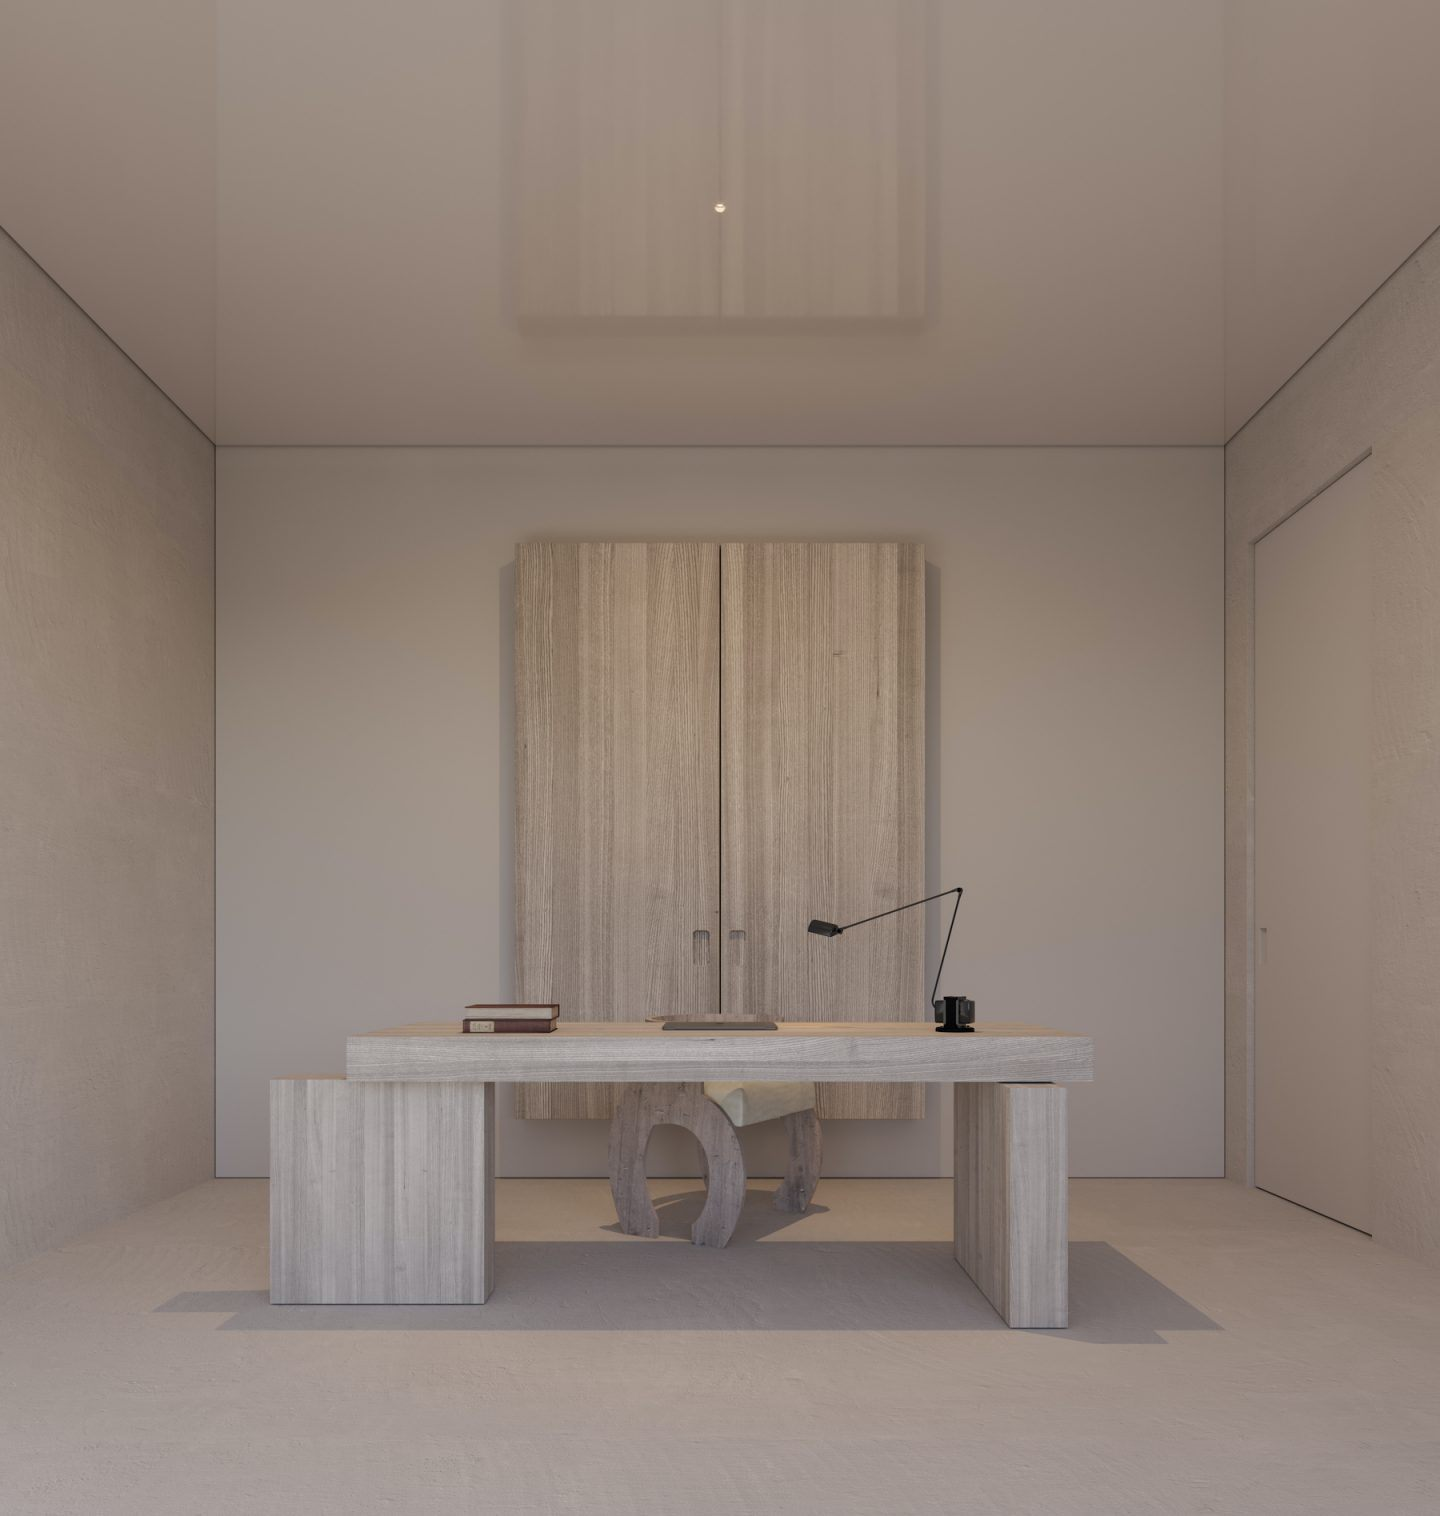 IGNANT-Design-Kanstantsin-Remez-II-Introvert-Residence-013